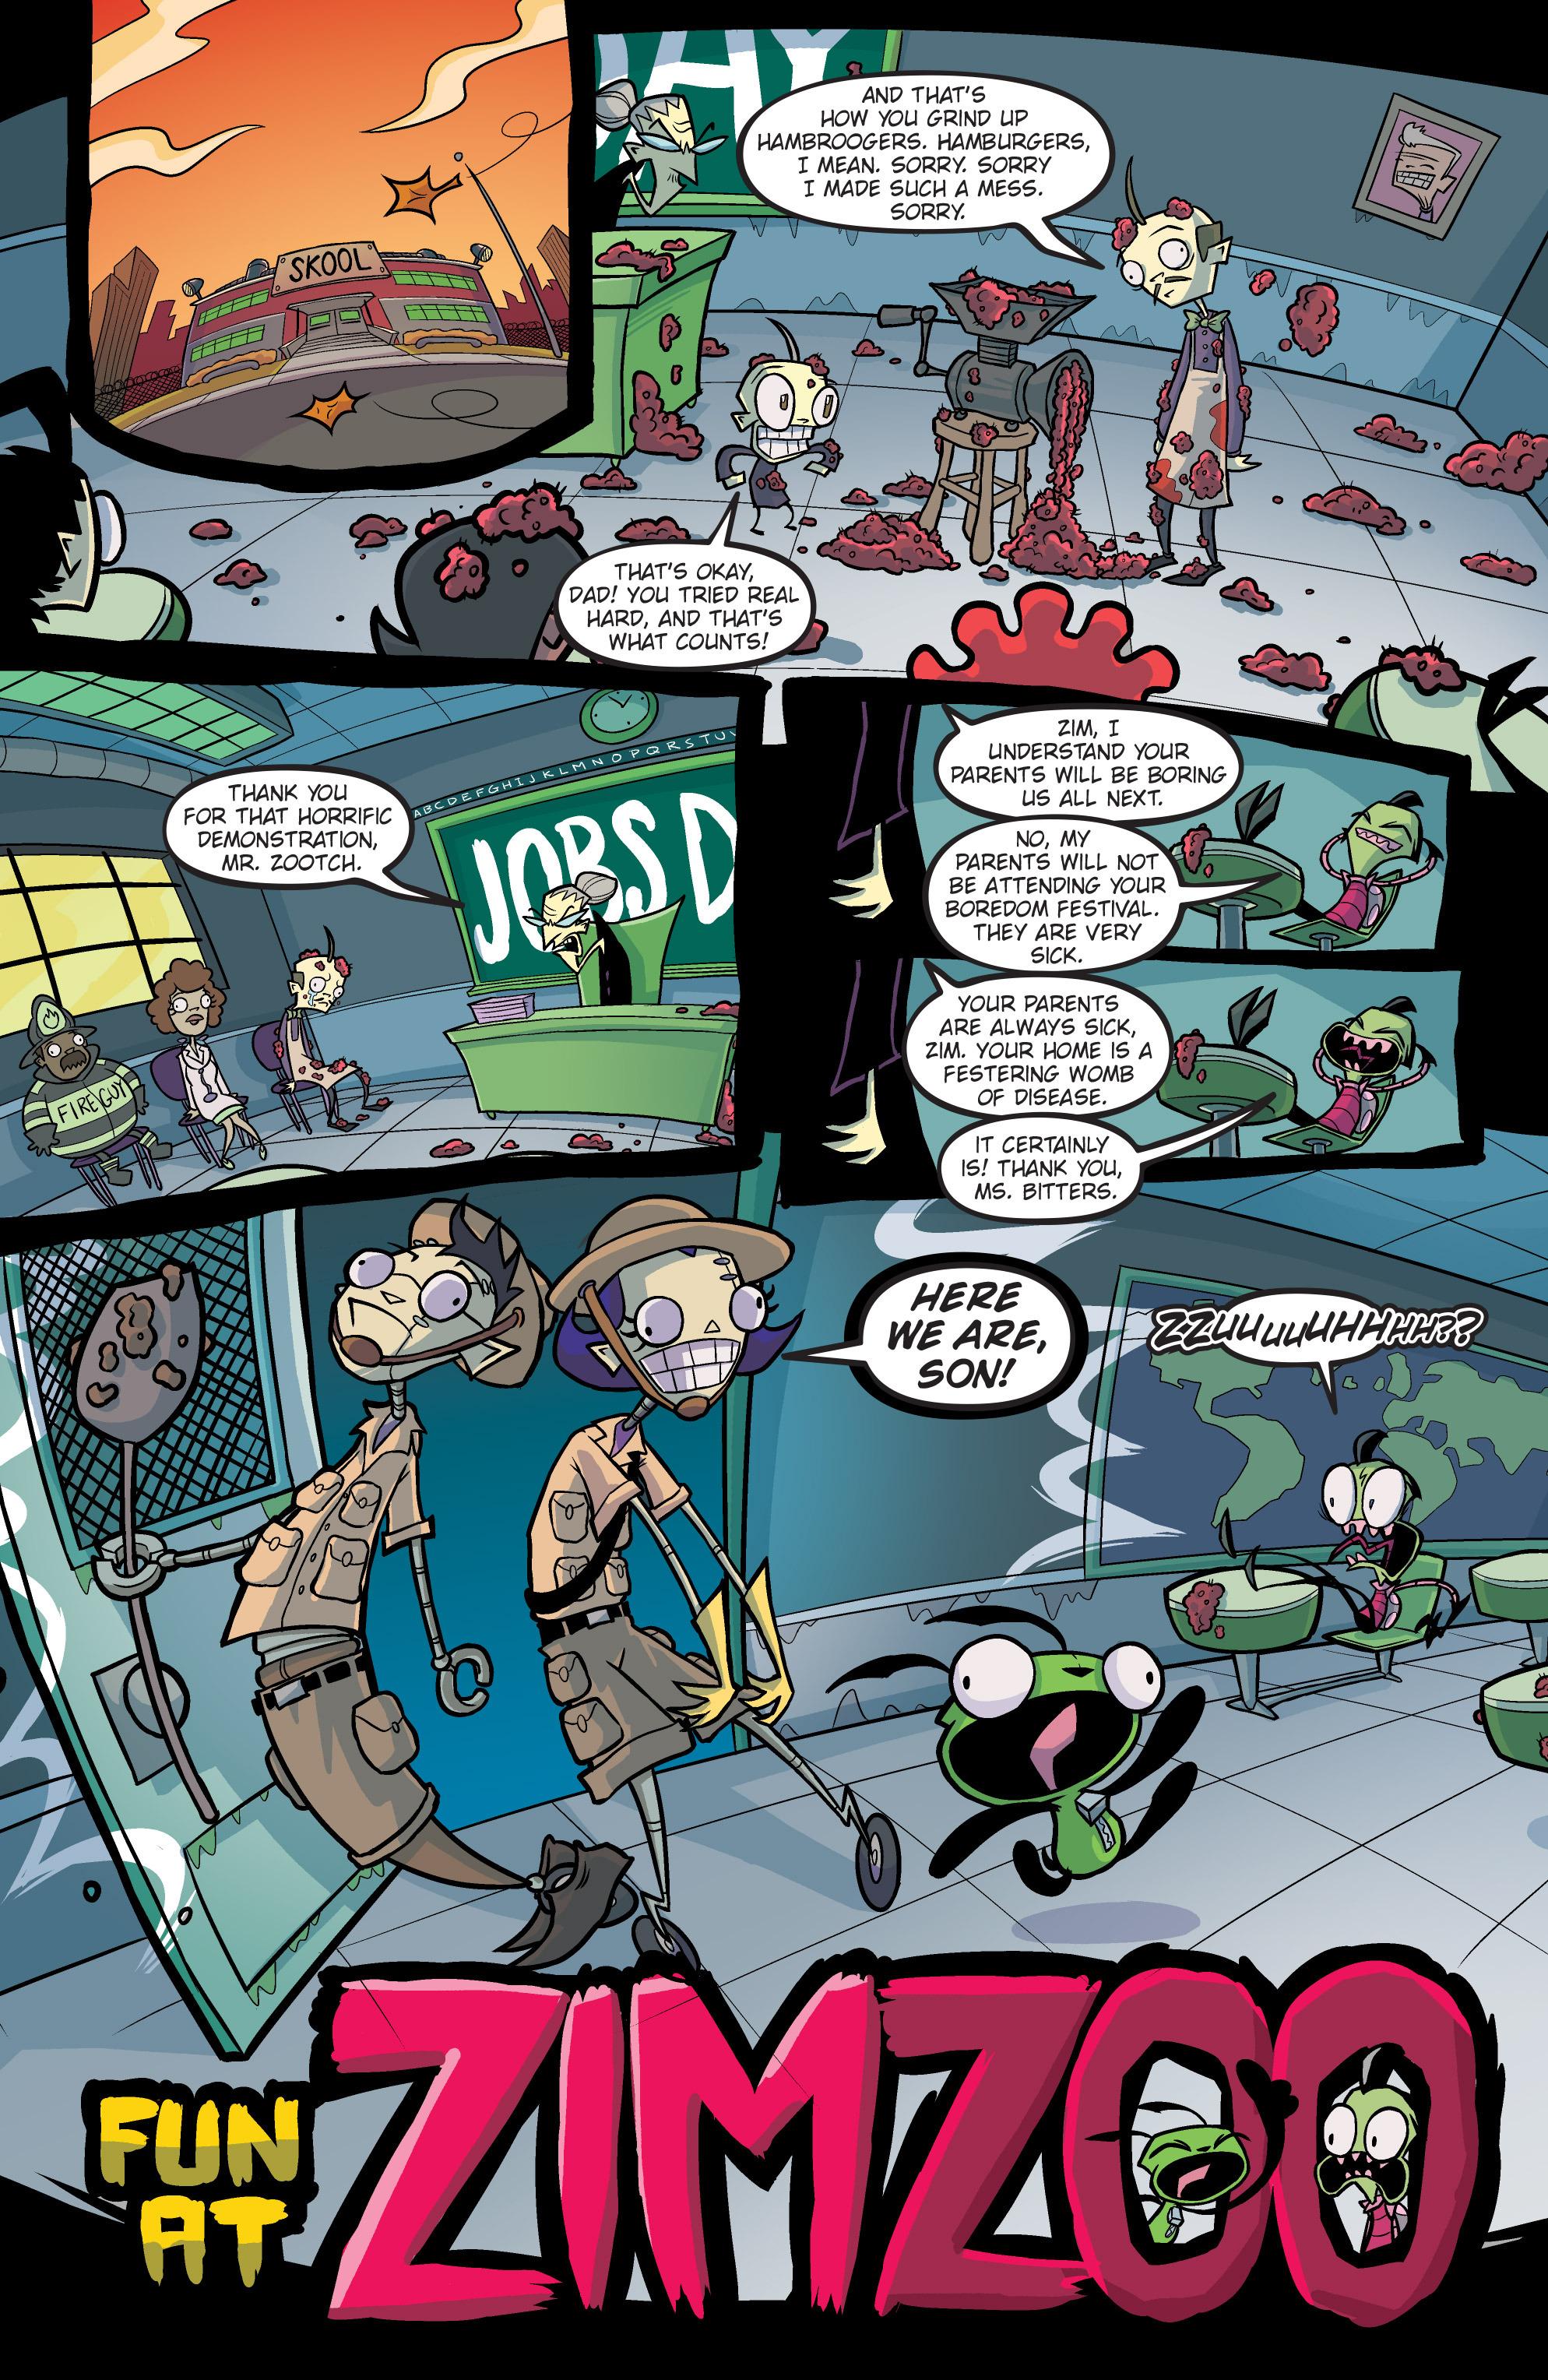 Read online Invader Zim comic -  Issue #19 - 3